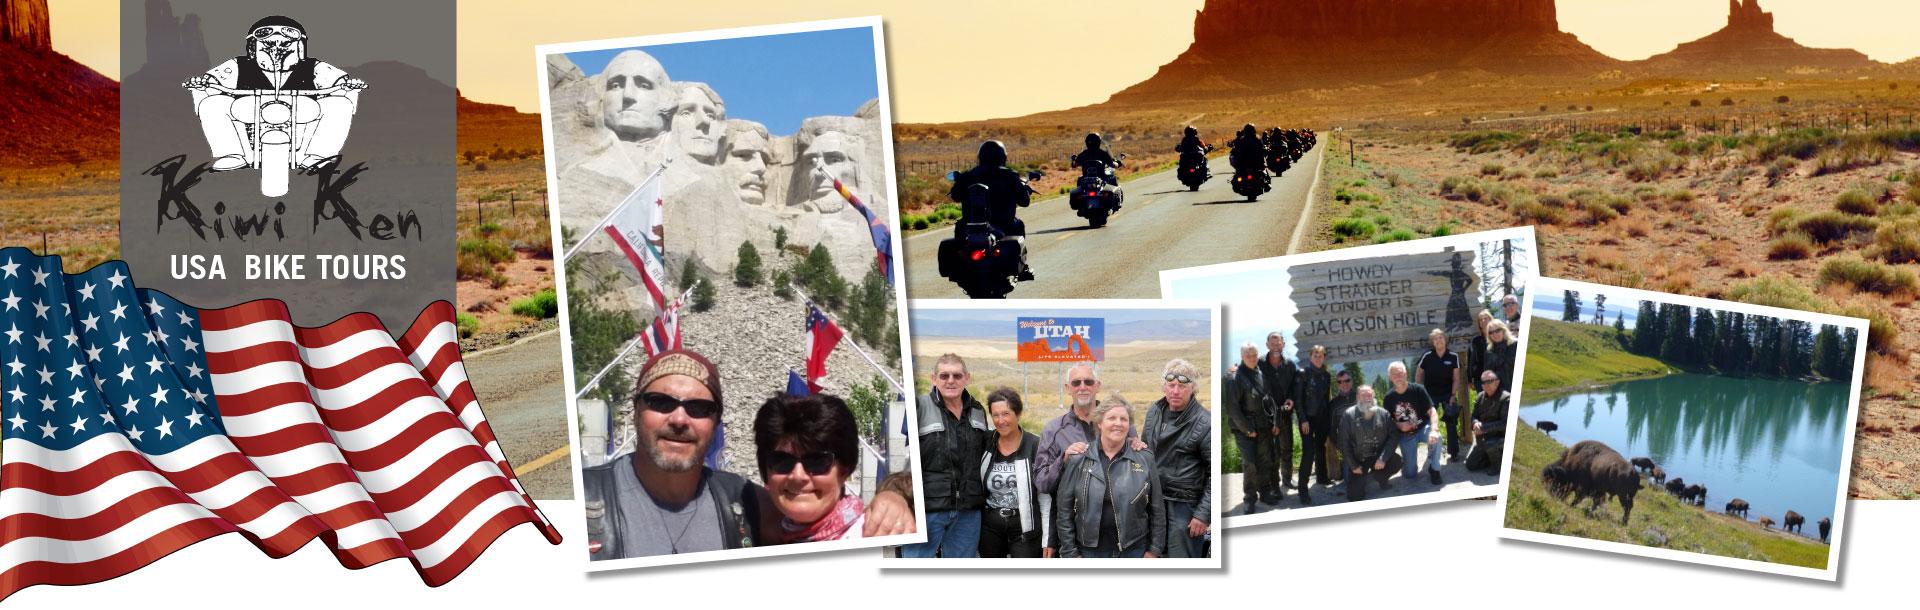 USA motorbike tours